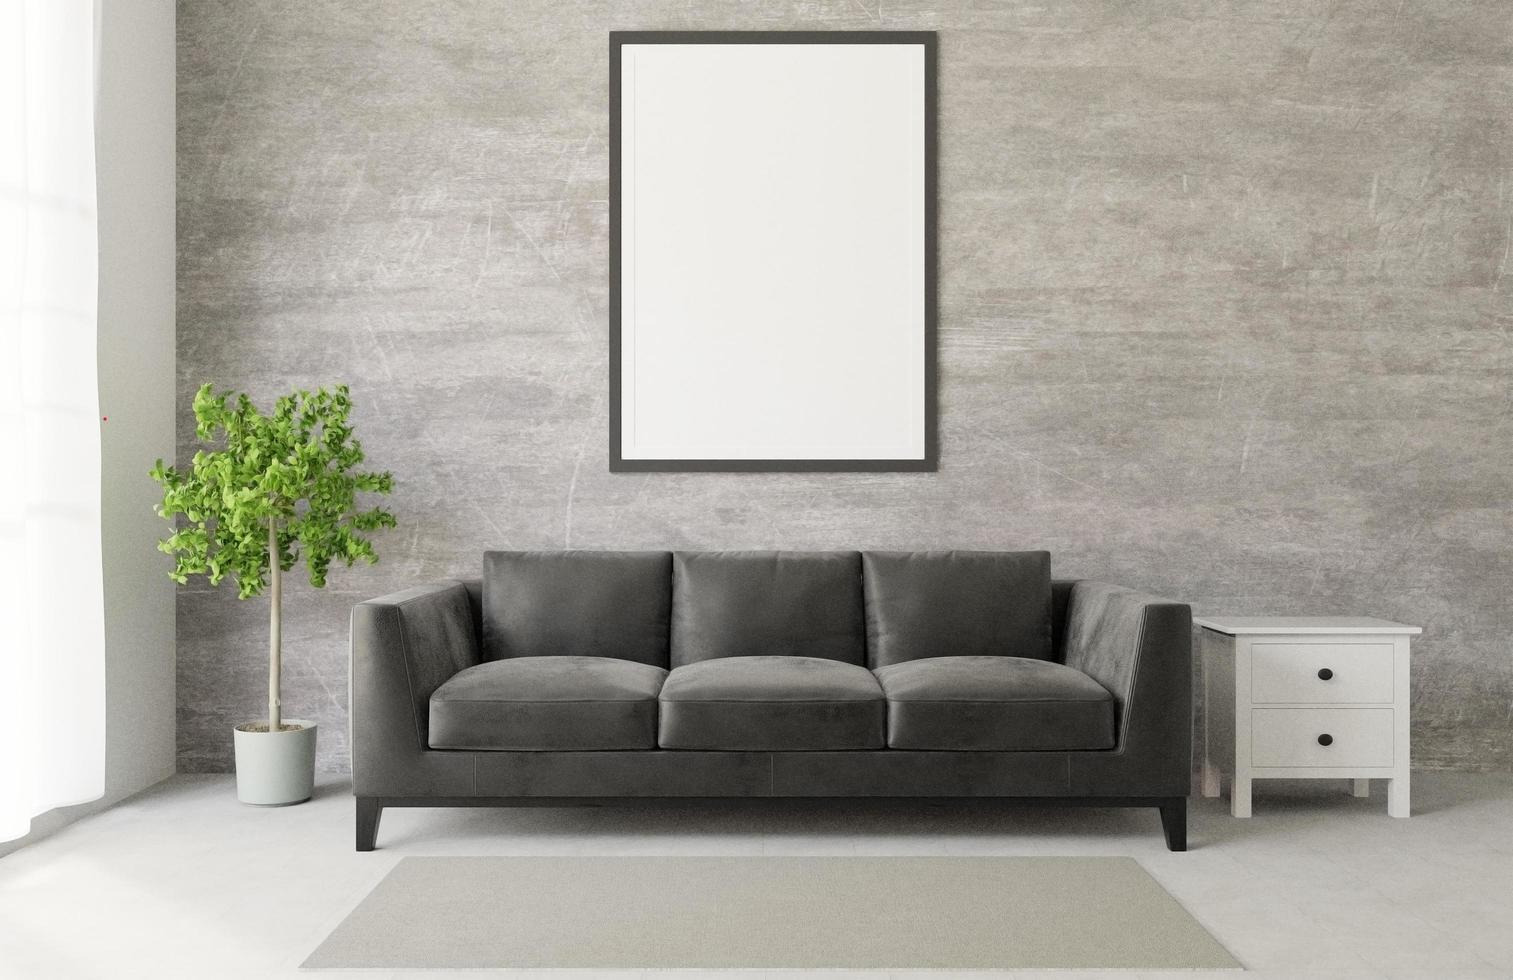 Loft style living room mock up photo